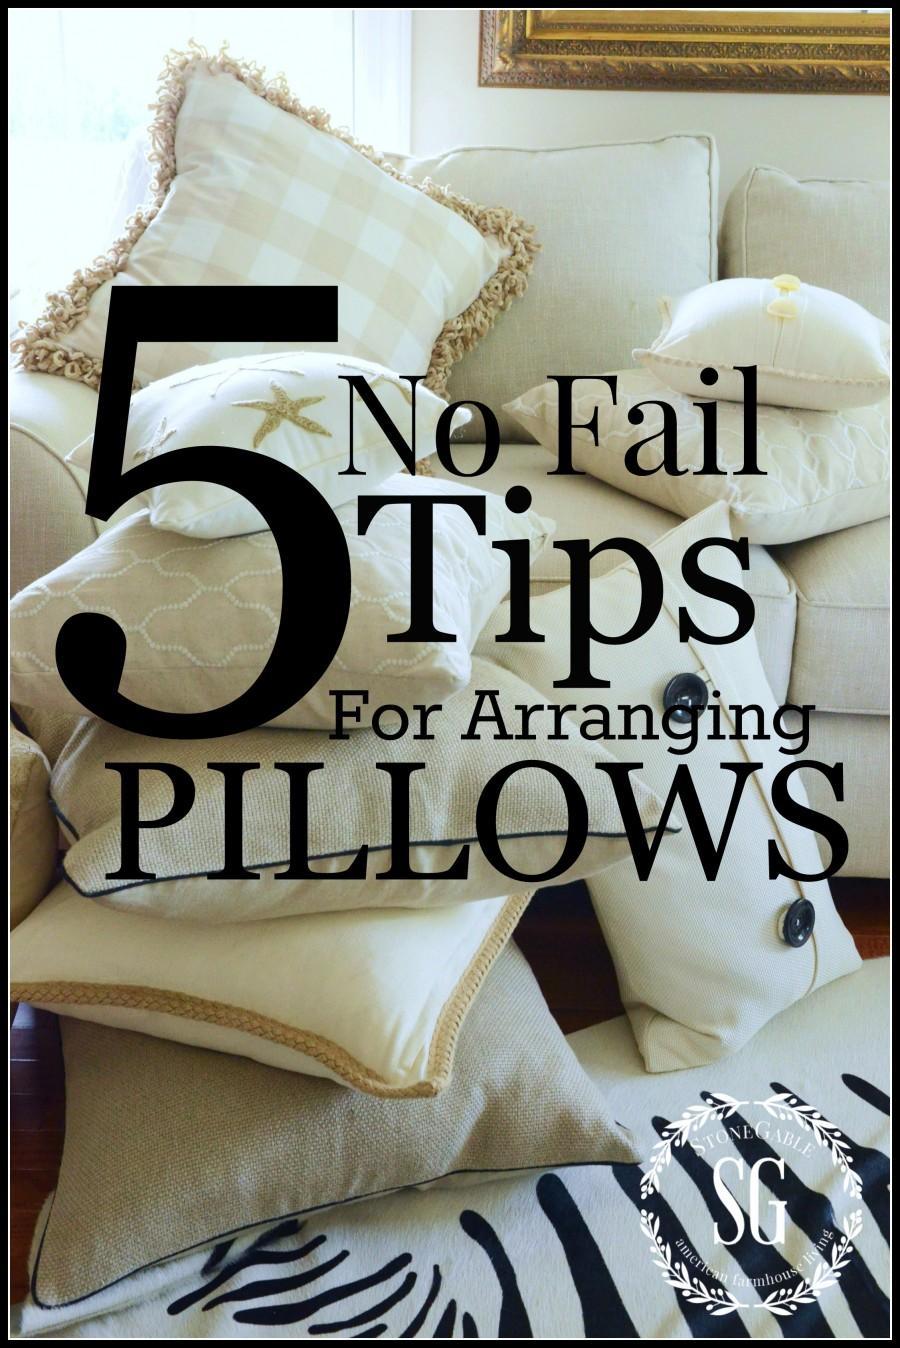 5 NO FAIL TIPS FOR ARRANGING PILLOWS